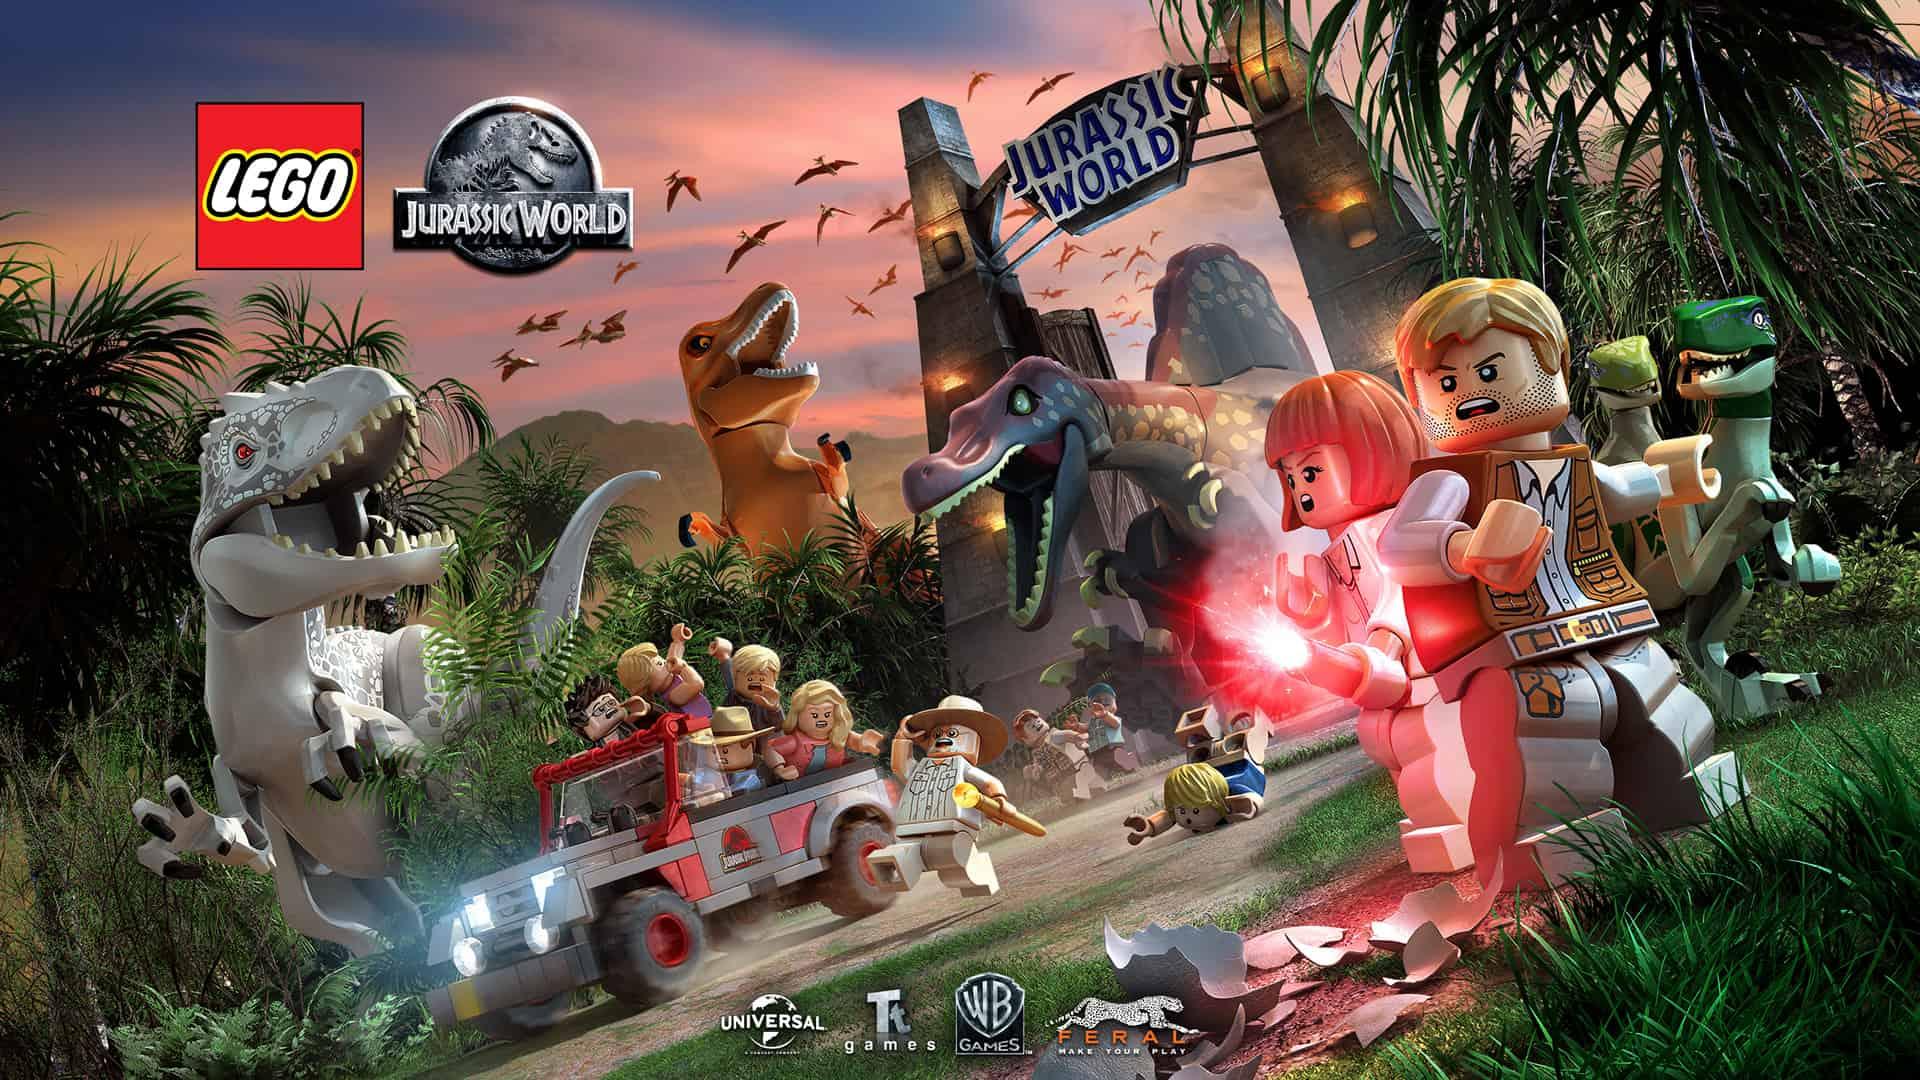 Warner Bros, TT Games & The LEGO Group Announce LEGO Jurassic World For Nintendo Switch